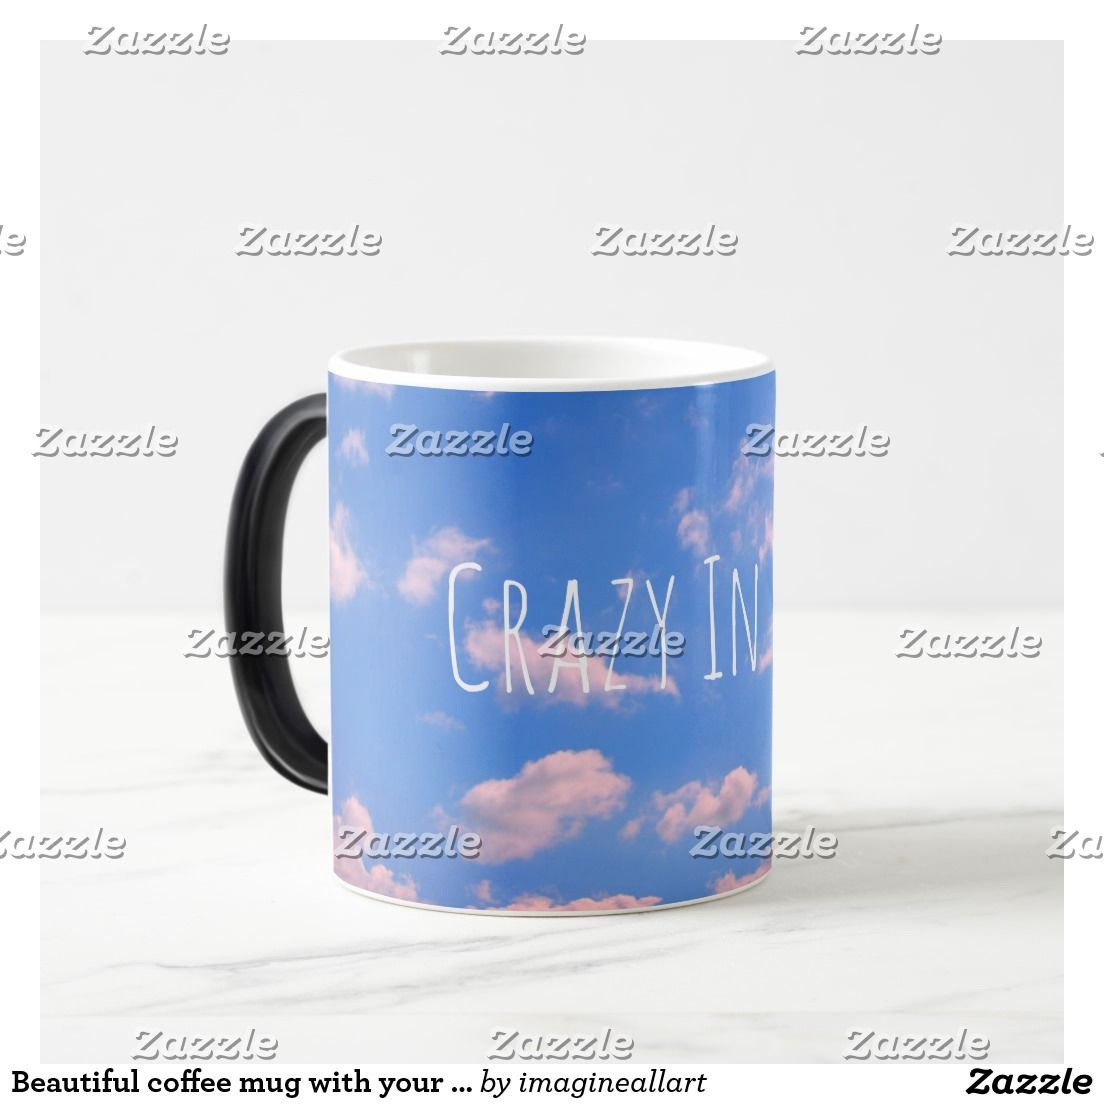 Beautiful coffee mug with your text